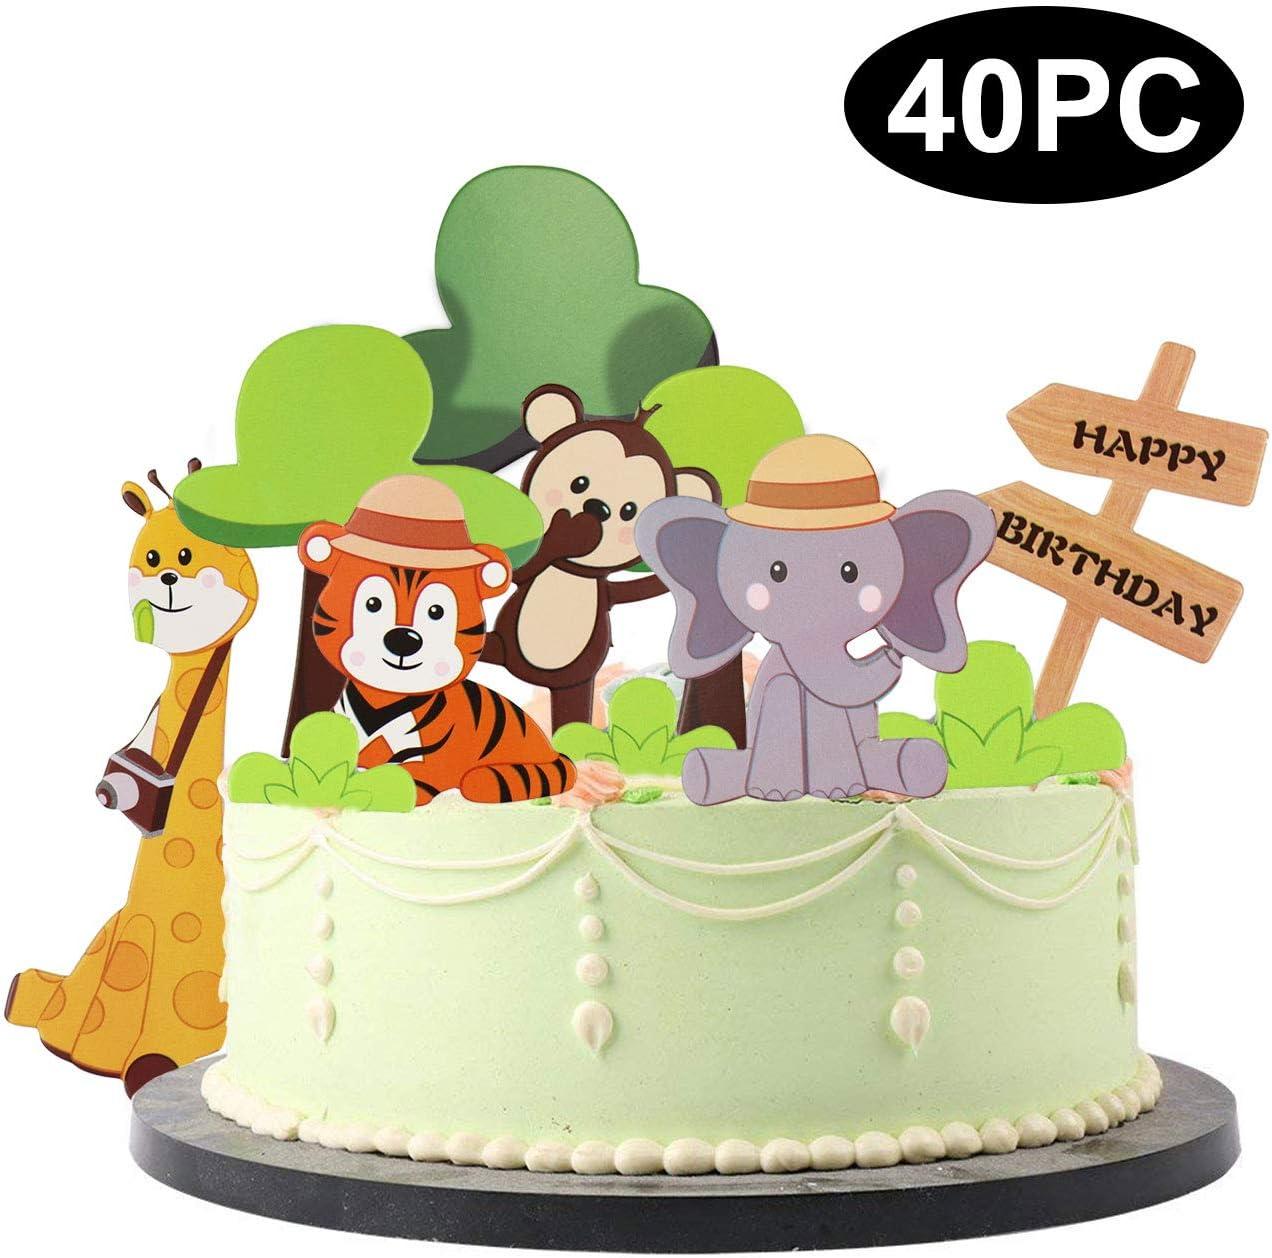 Strange Busoha Animals Cake Toppers 40 Pcs Safari Cake Toppers Jungle Zoo Funny Birthday Cards Online Amentibdeldamsfinfo